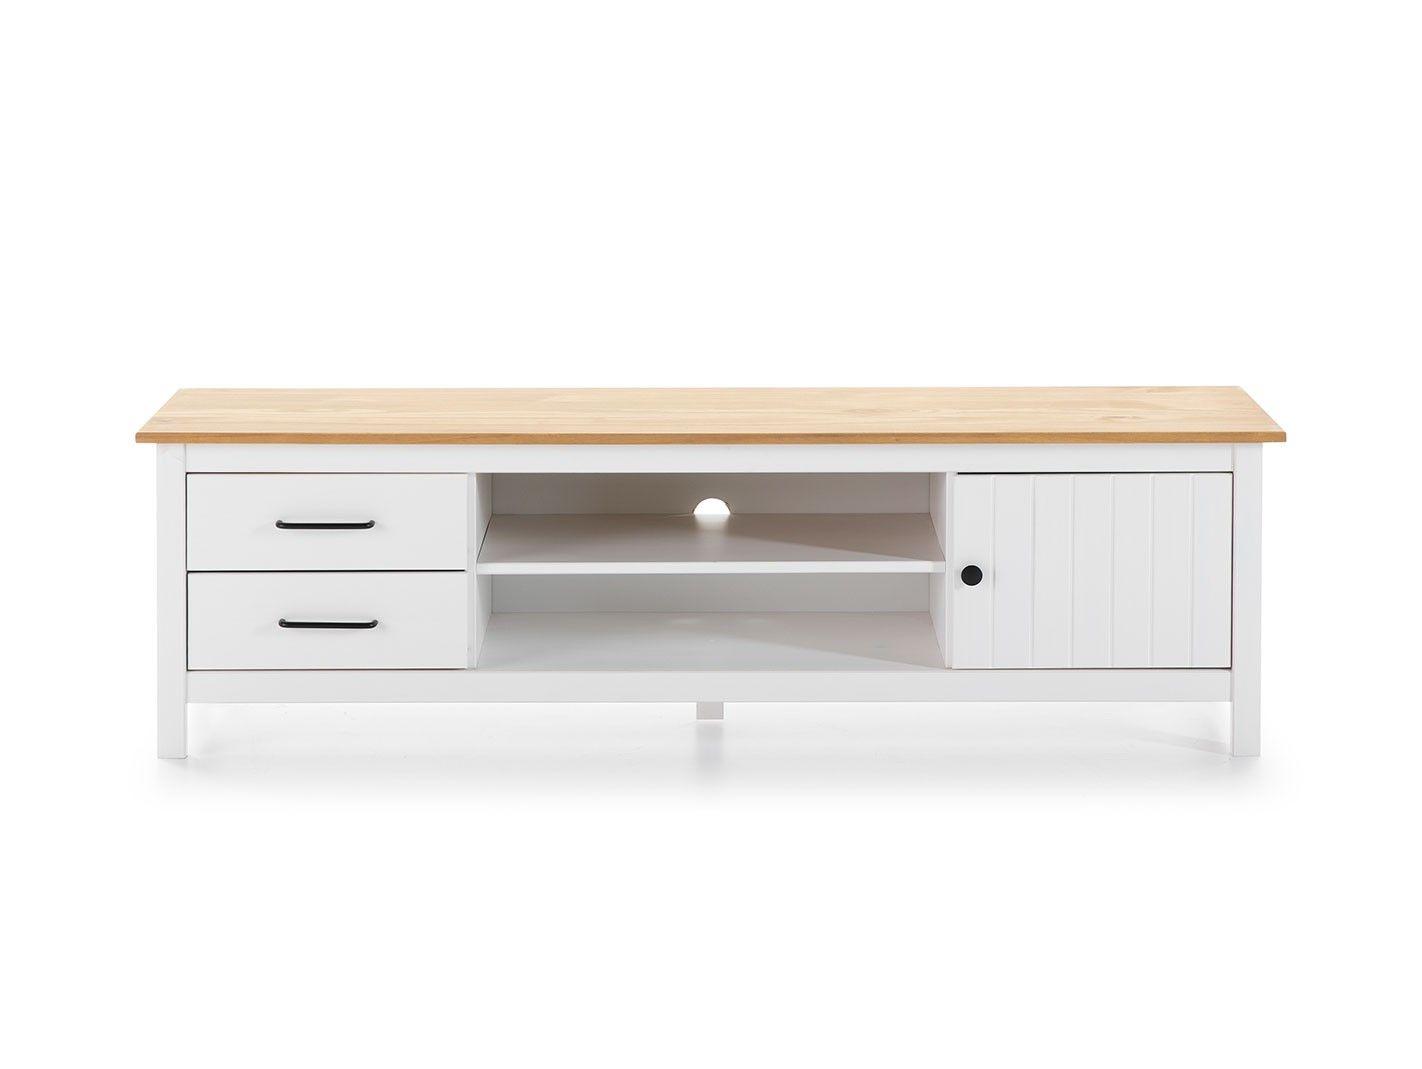 Mueble zapatero 3 puertas color eco polar for Mueble zapatero de pino